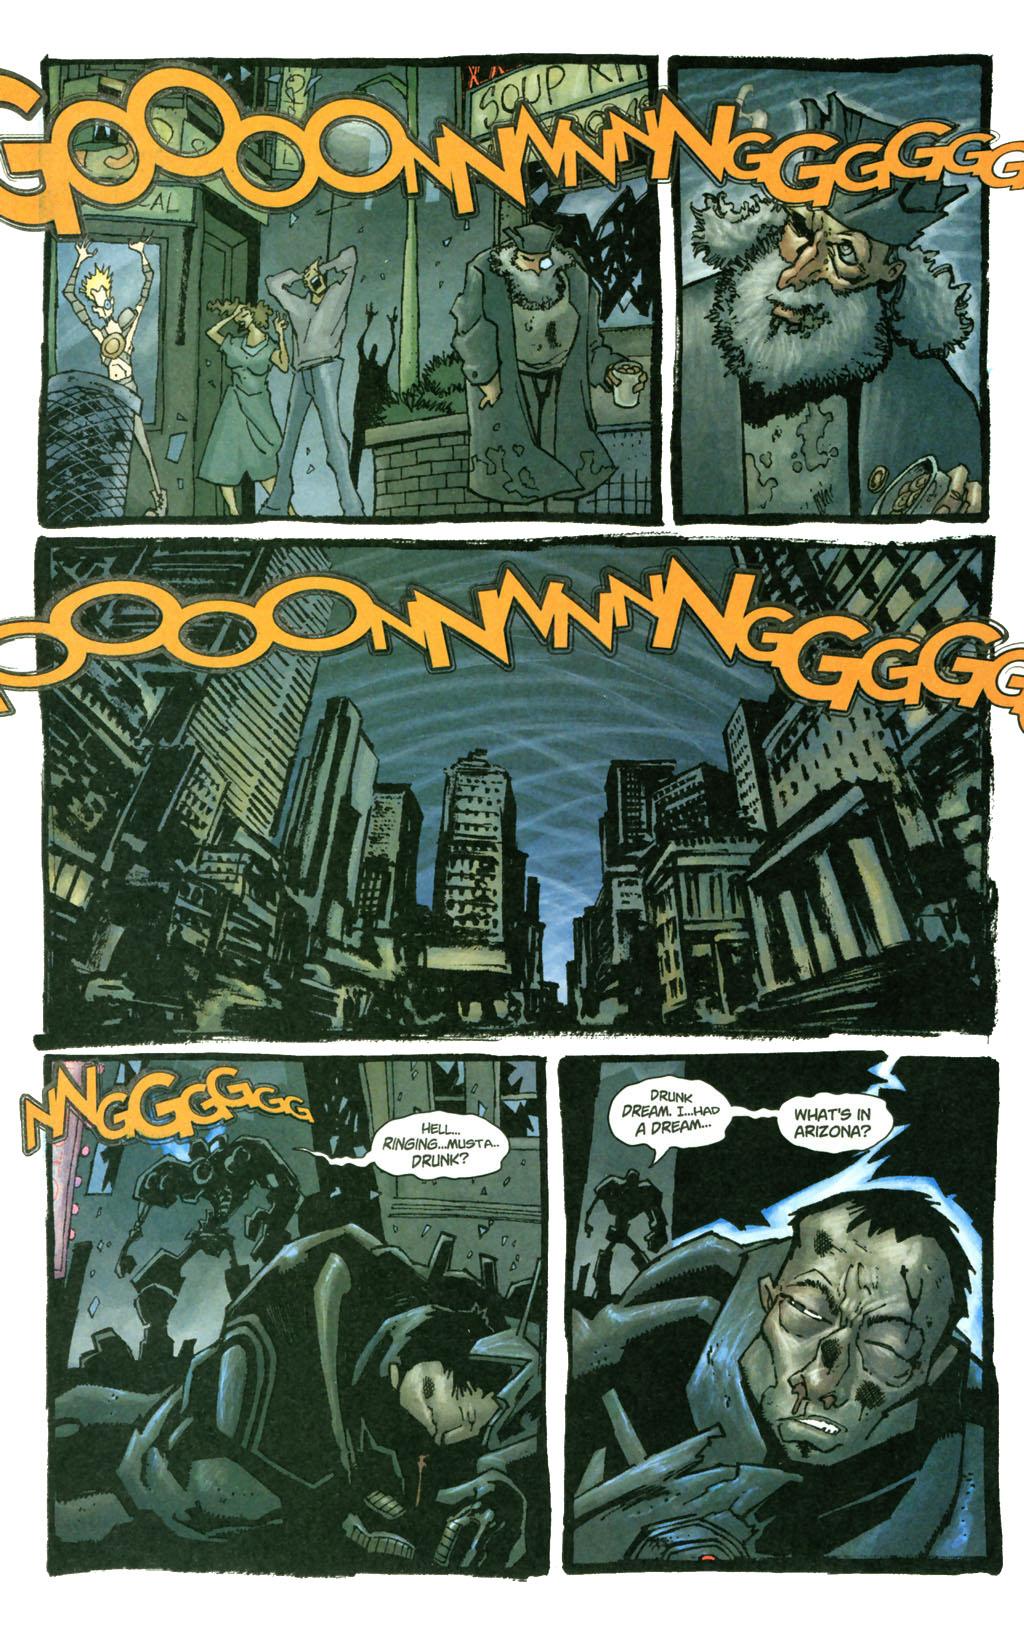 Read online Enginehead comic -  Issue #4 - 19